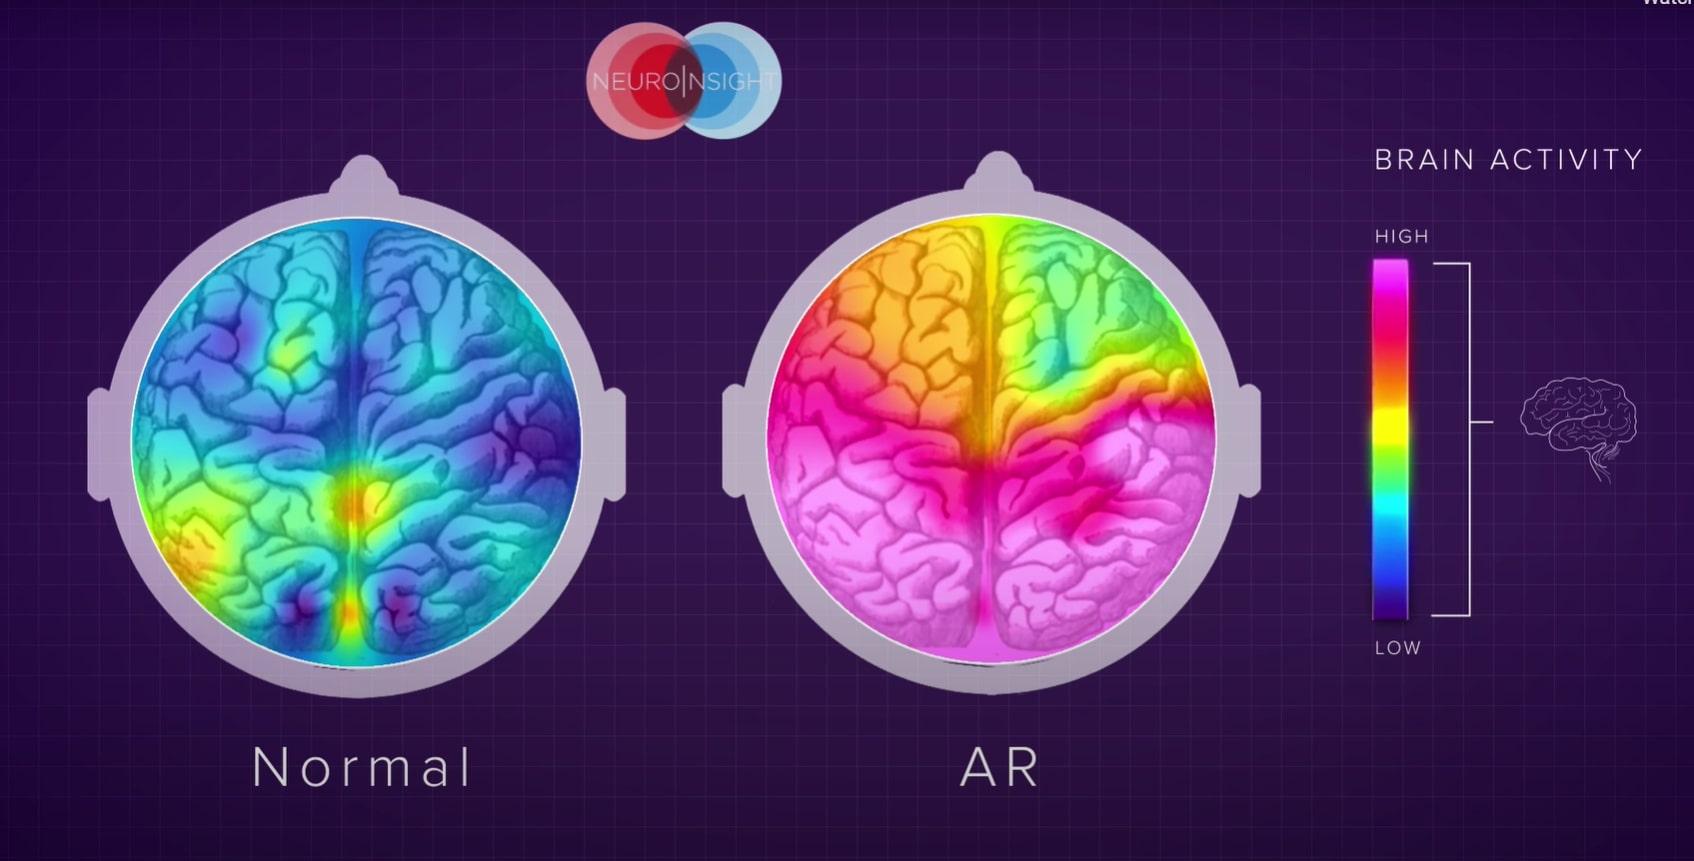 custom AR ads on brains